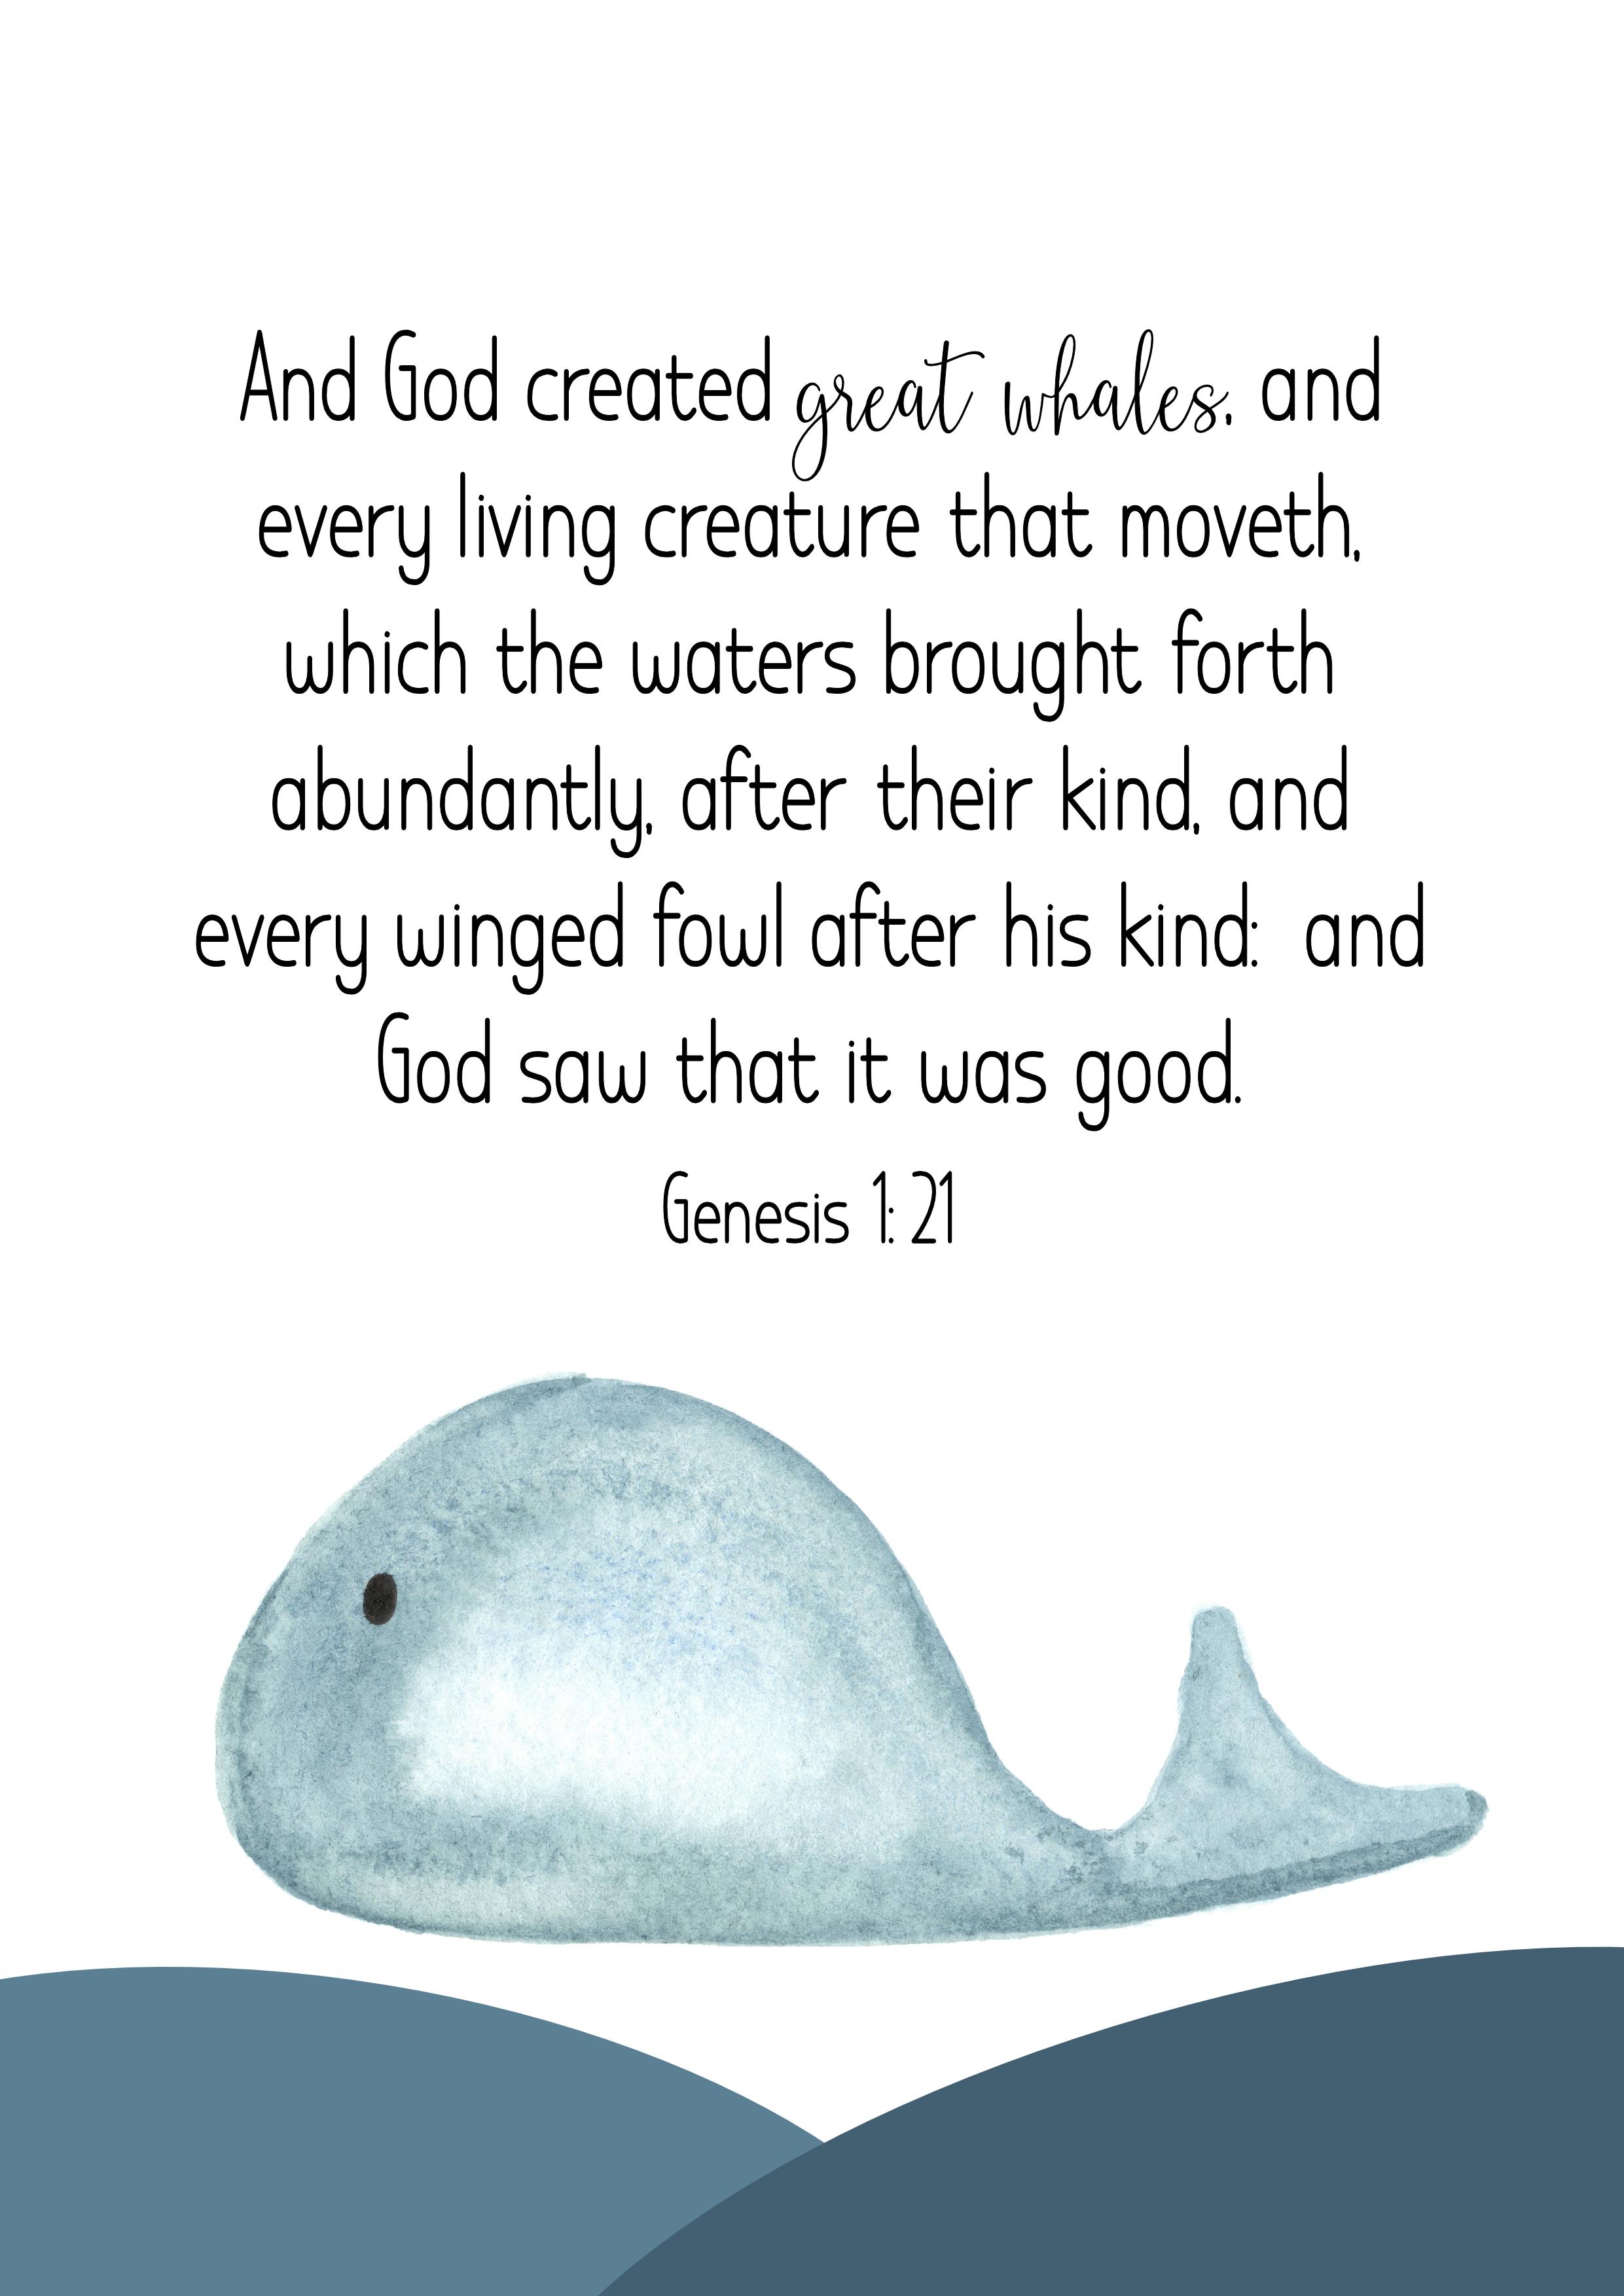 Genesis 1:21, Poster, JPG, King James Bible 1611, Ministries, Nederland